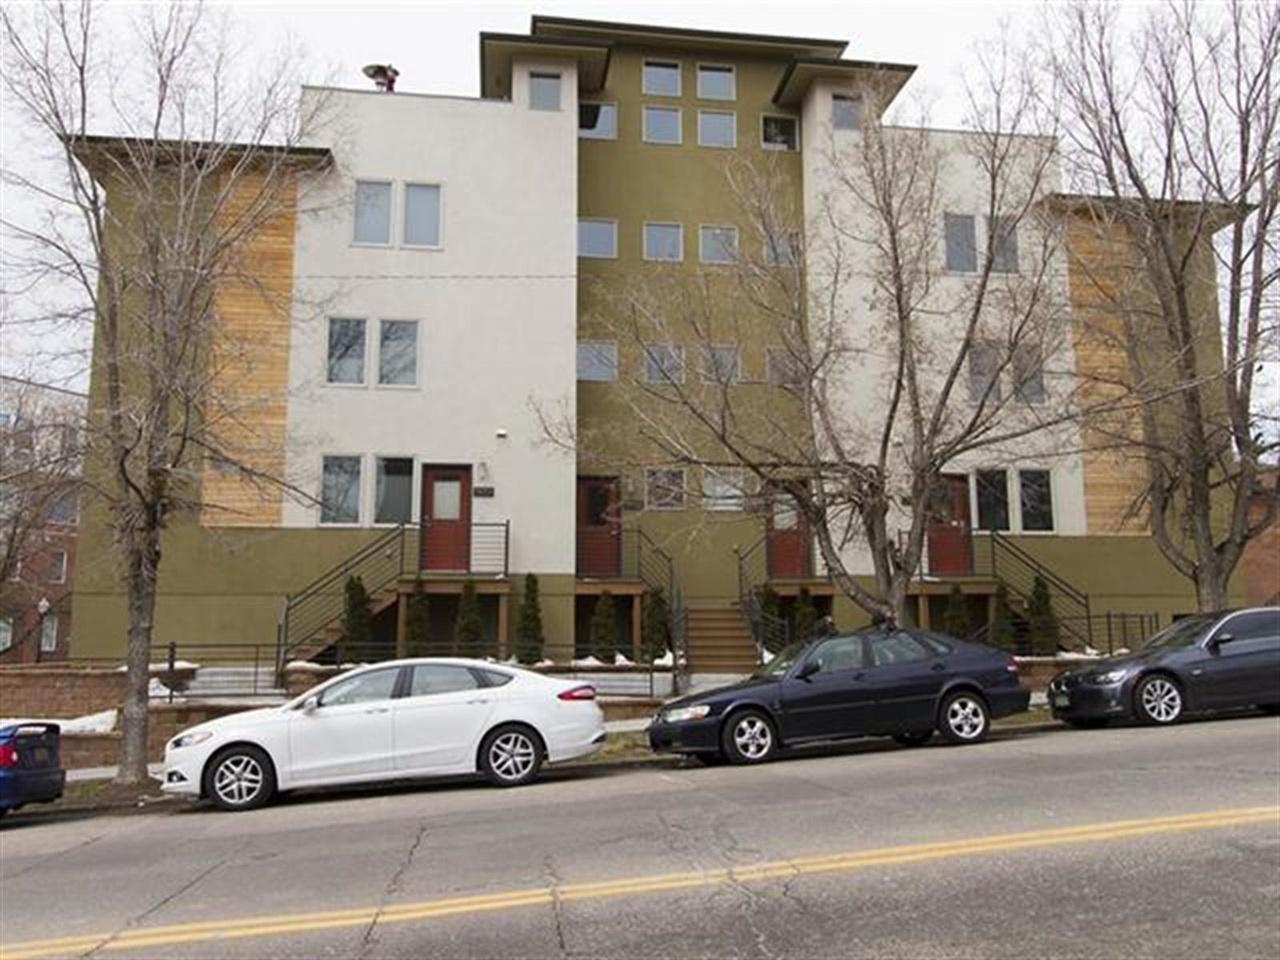 3055 Zuni St, Denver, CO 80211 | MLS# 1195033 | Redfin